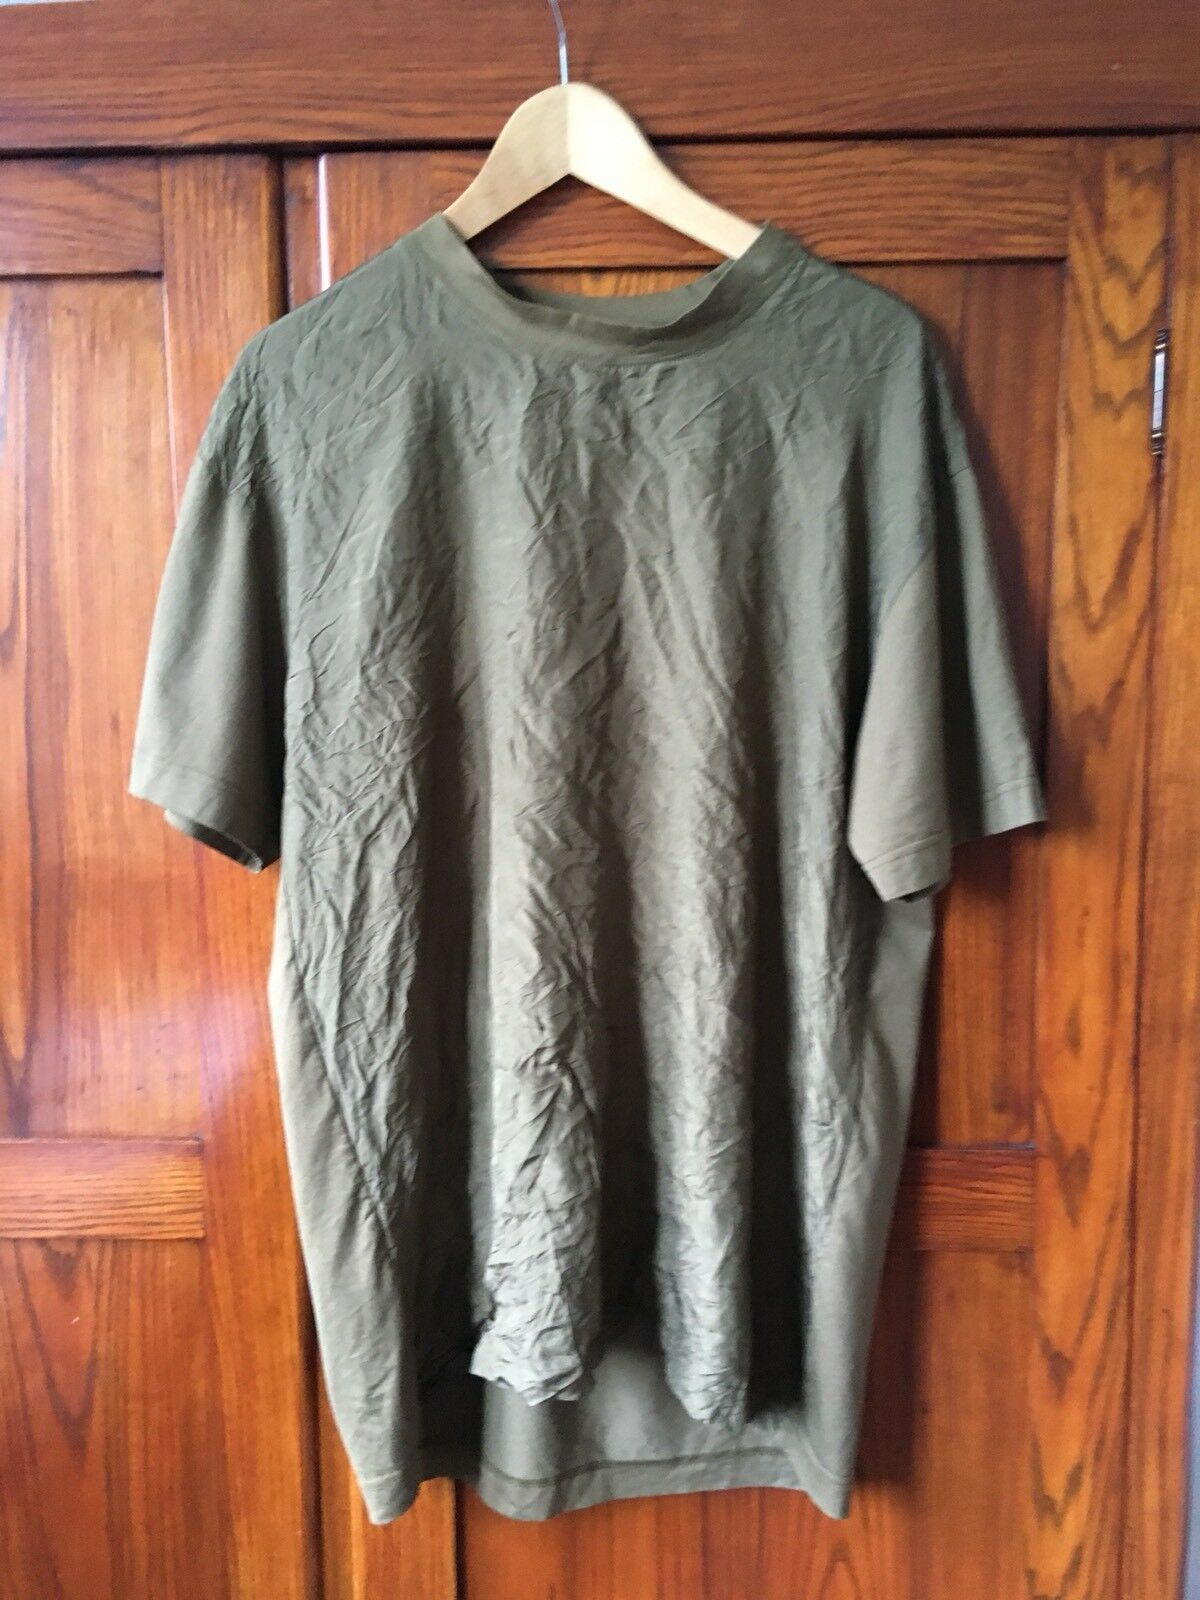 McQ Alexander McQueen Wrinkled Boxy T-shirt